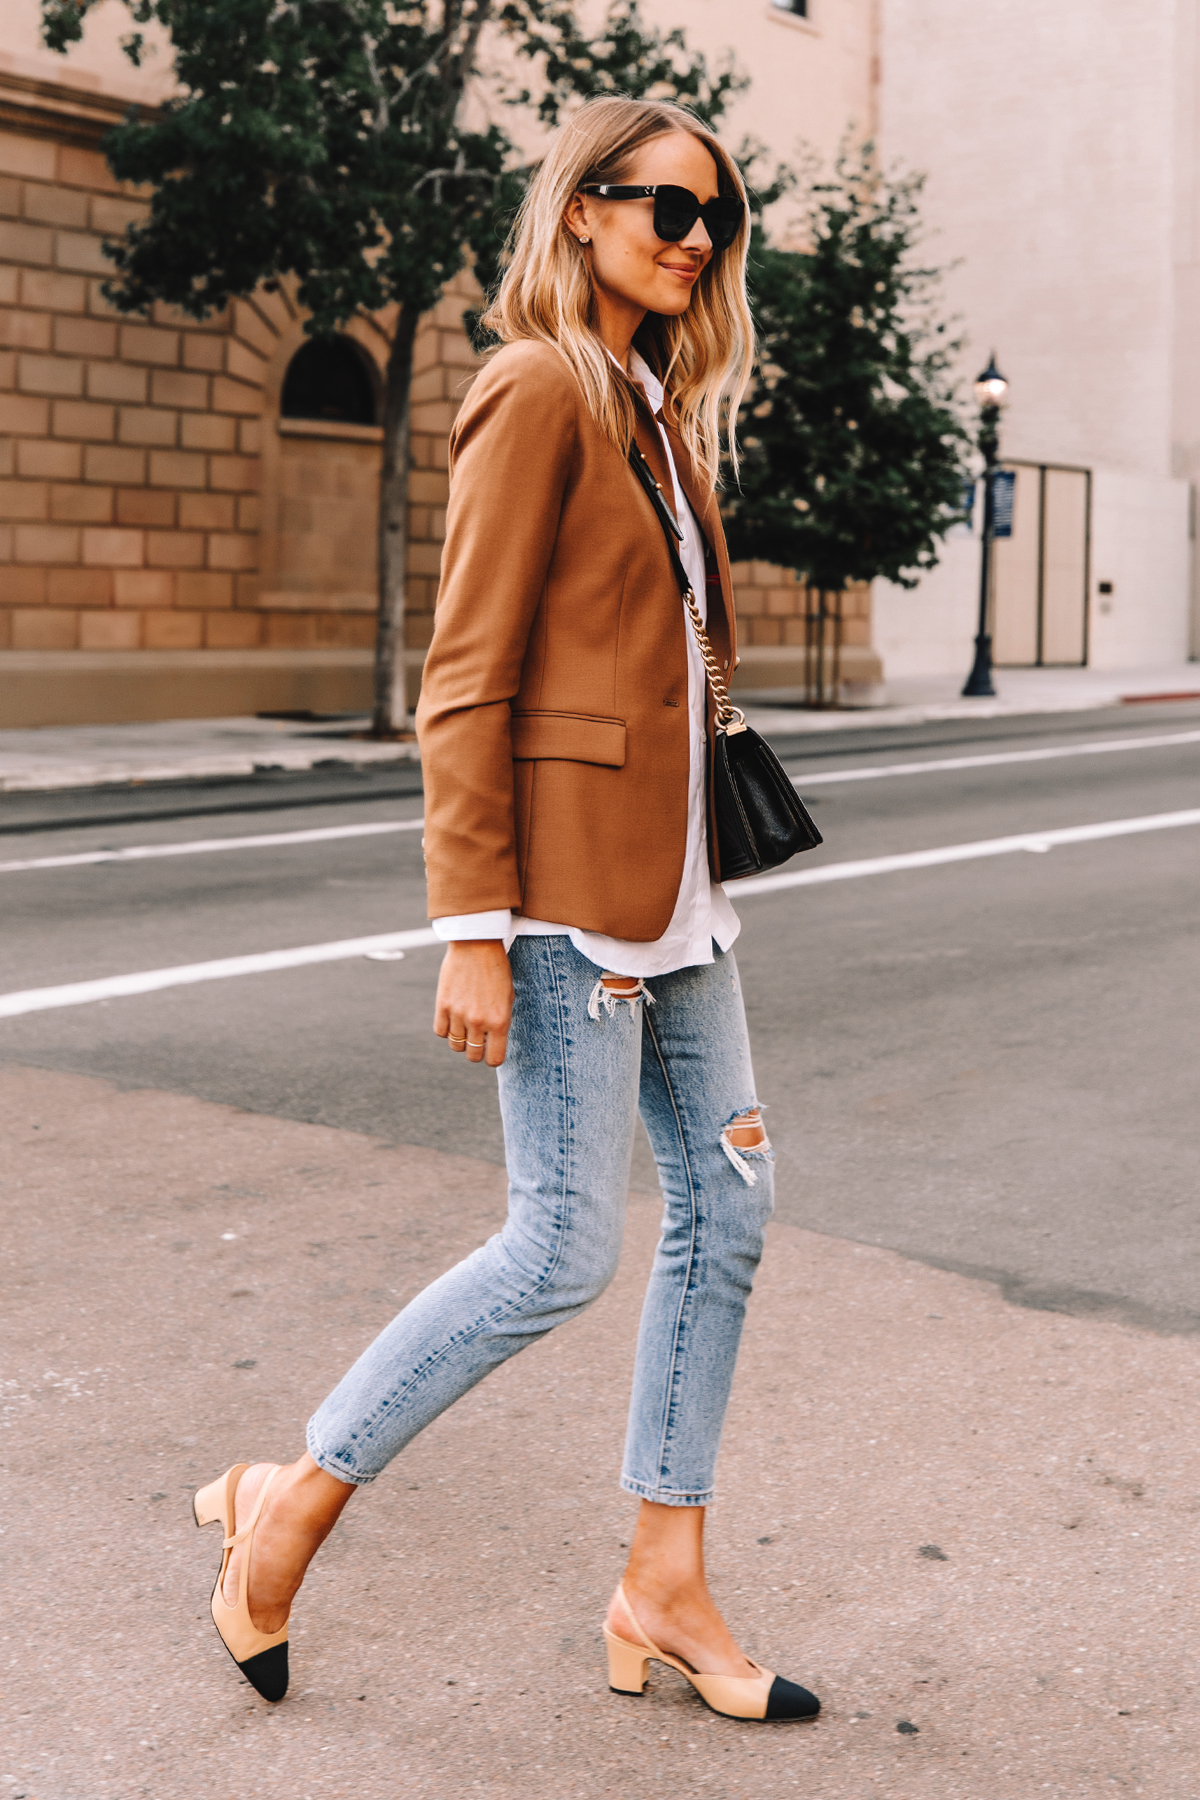 Fashion Jackson Wearing Jcrew Regent Blazer Camel White Shirt Levis 501 Ripped Jeans Chanel Slingbacks